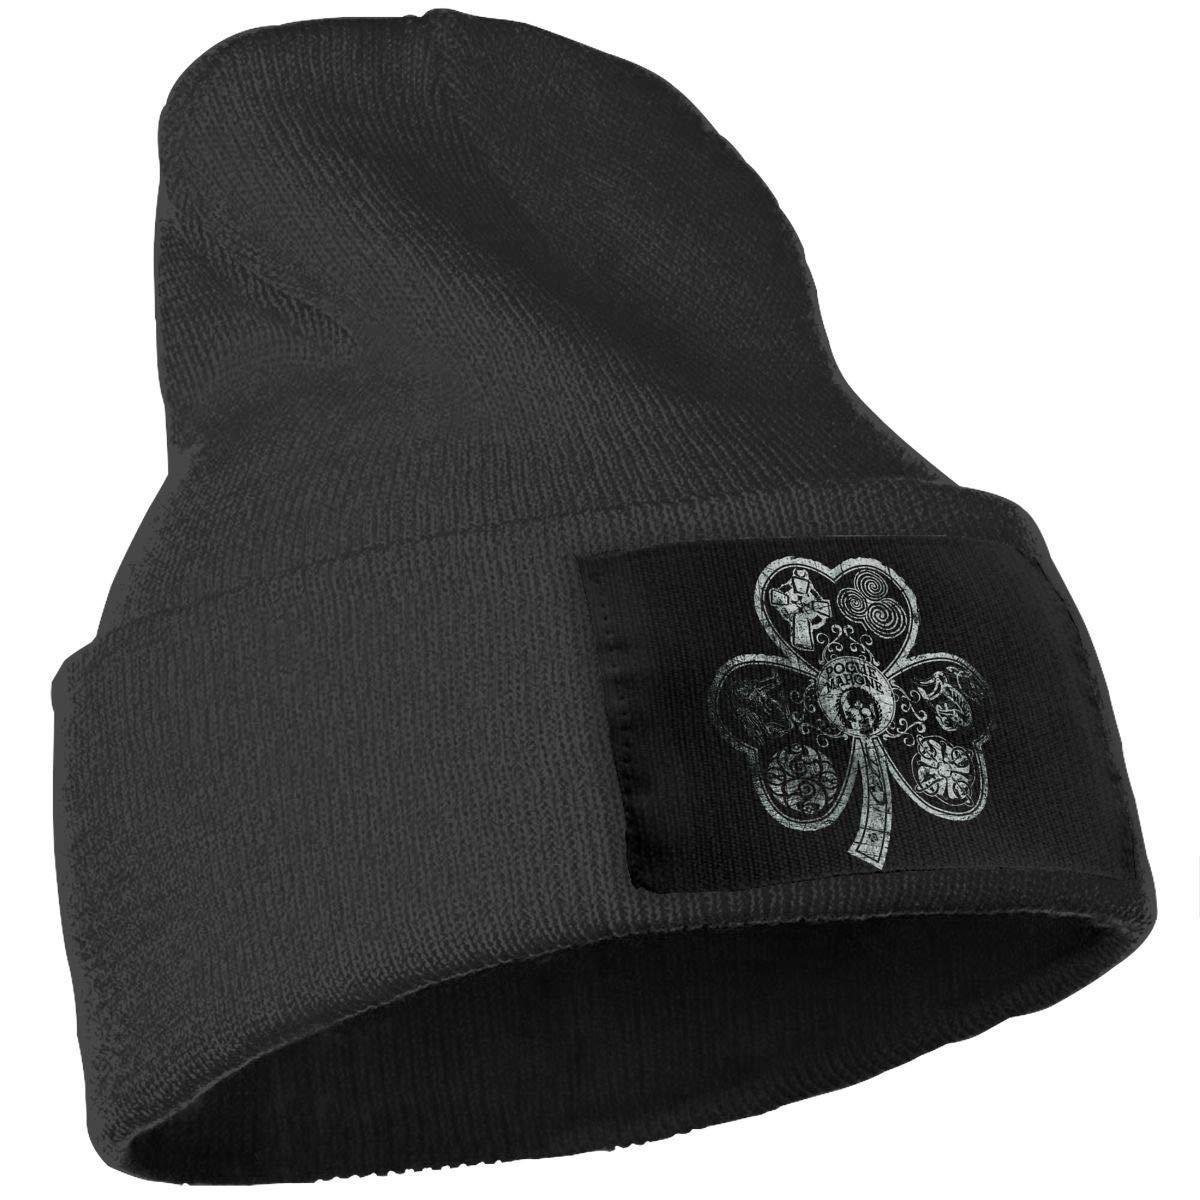 QZqDQ Pogue Mahone Unisex Fashion Knitted Hat Luxury Hip-Hop Cap